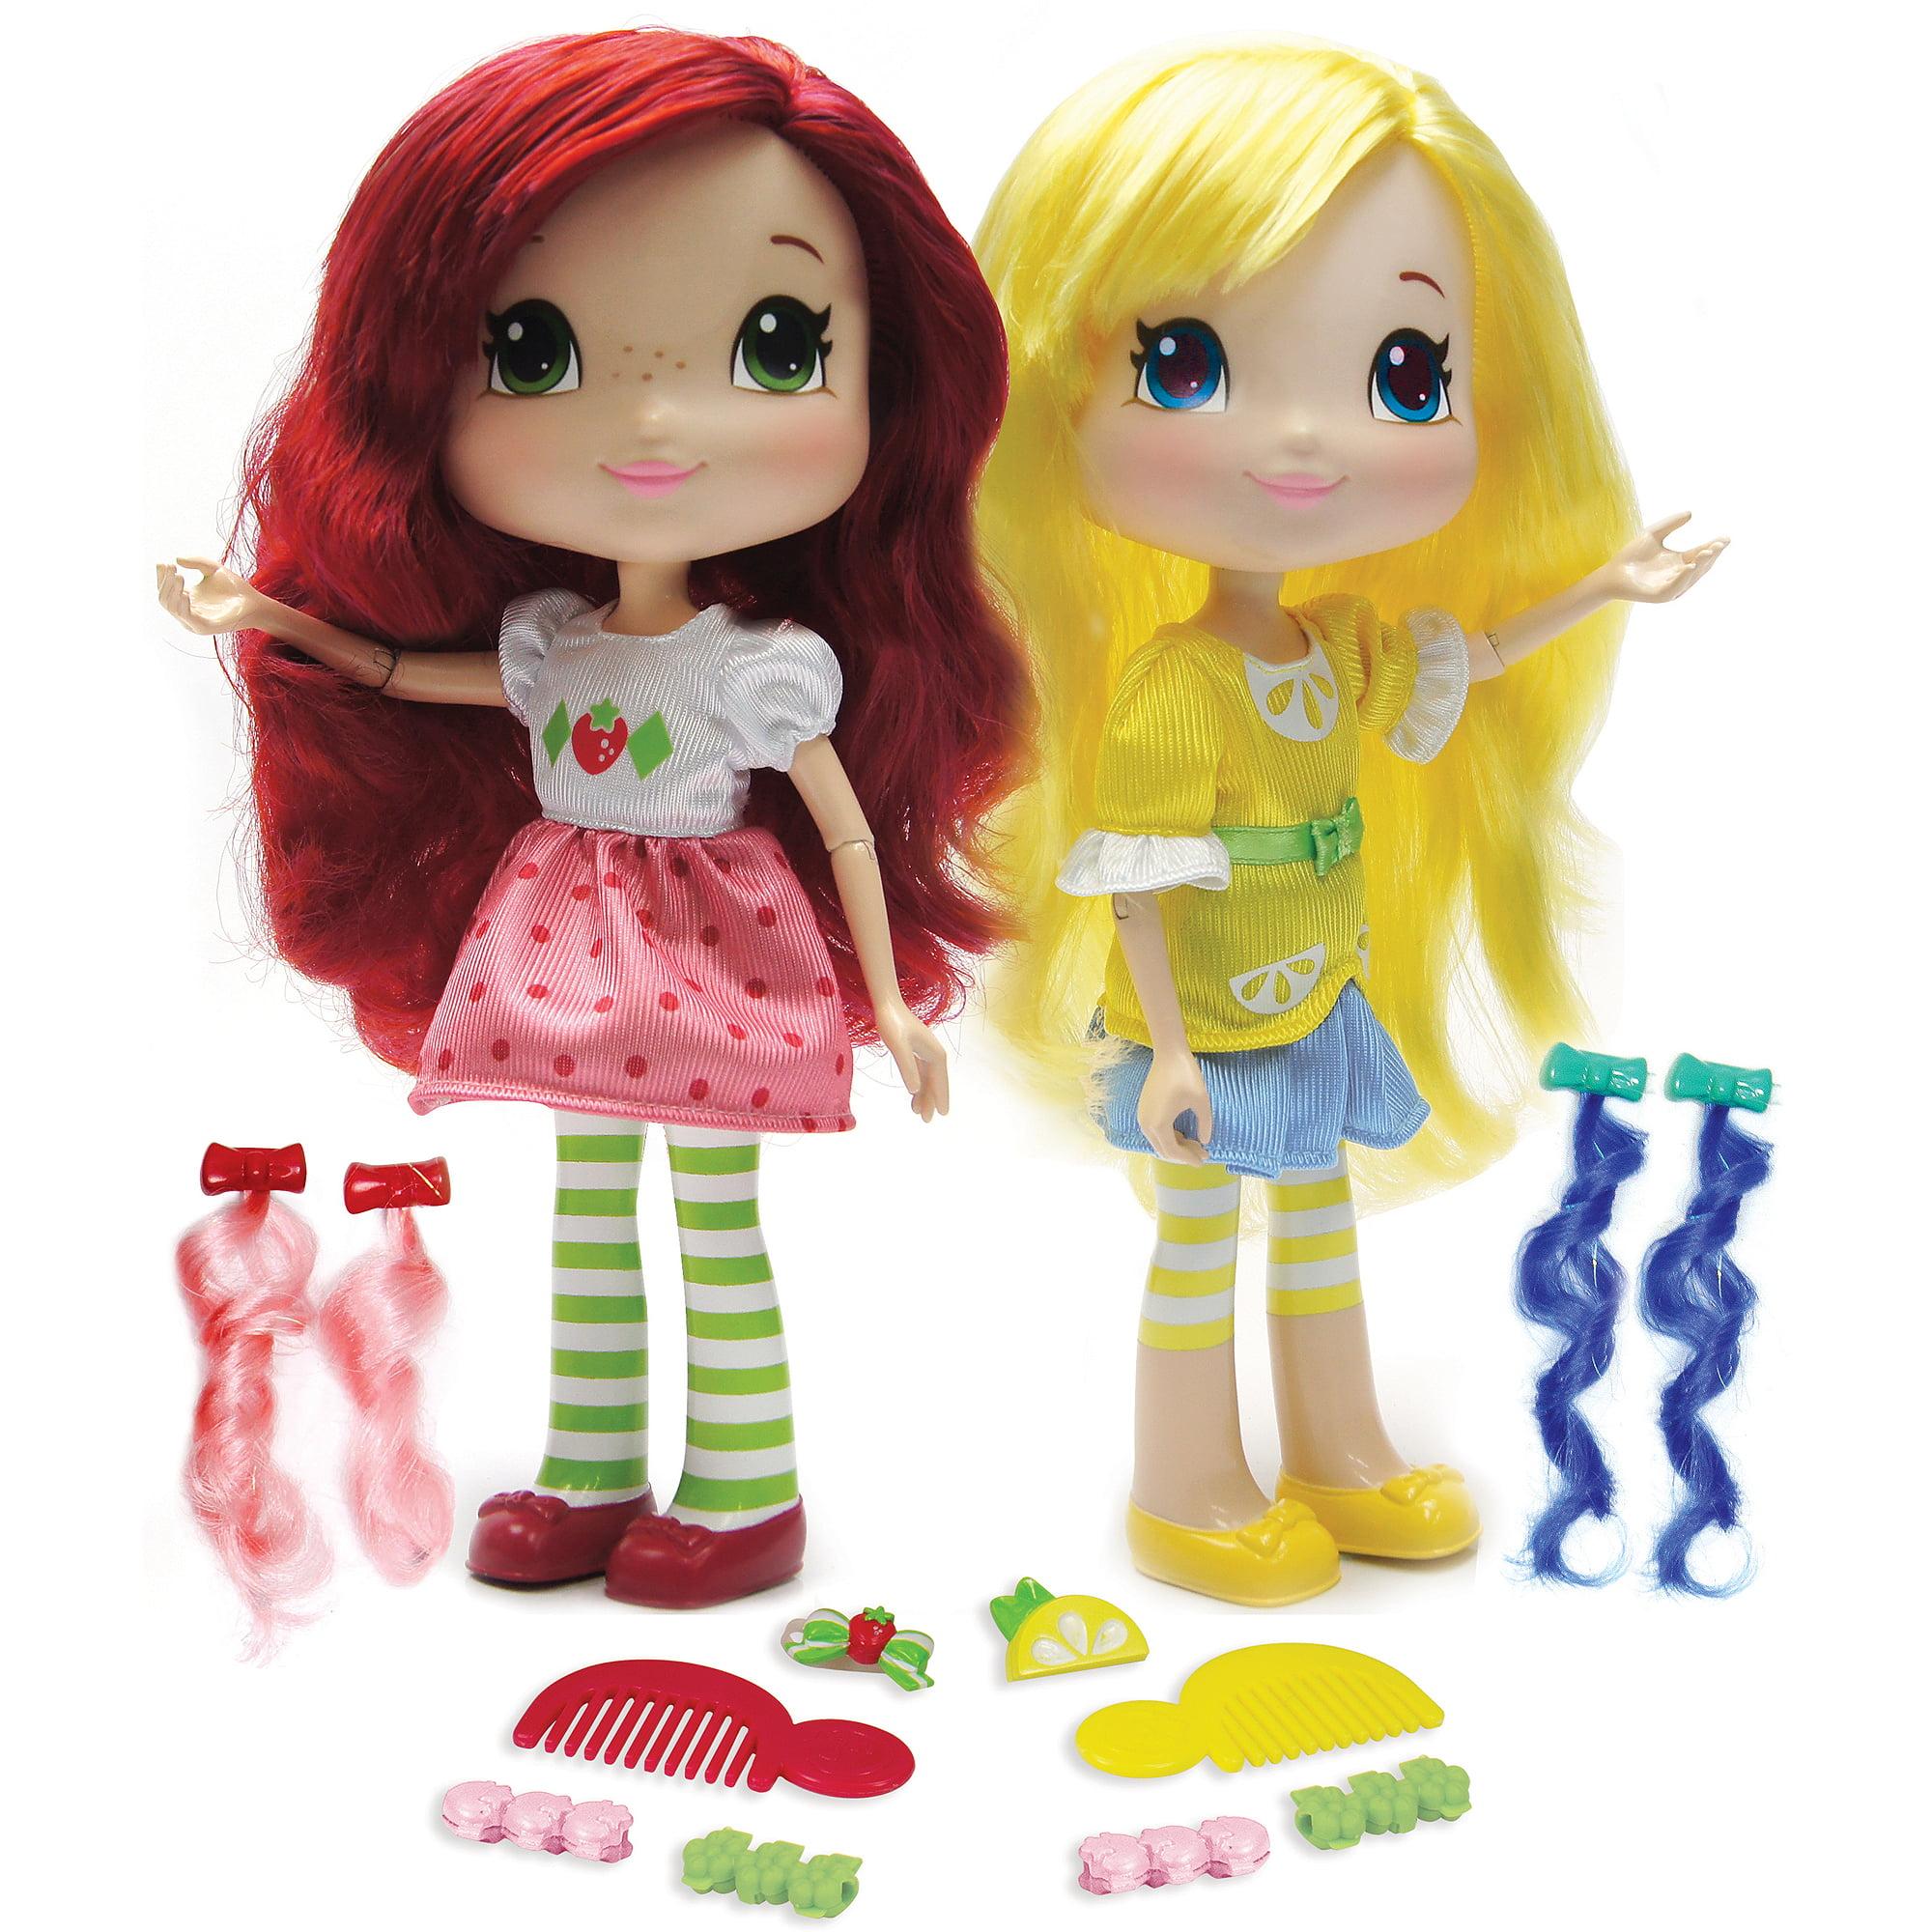 Lemon Meringue Doll Walmart